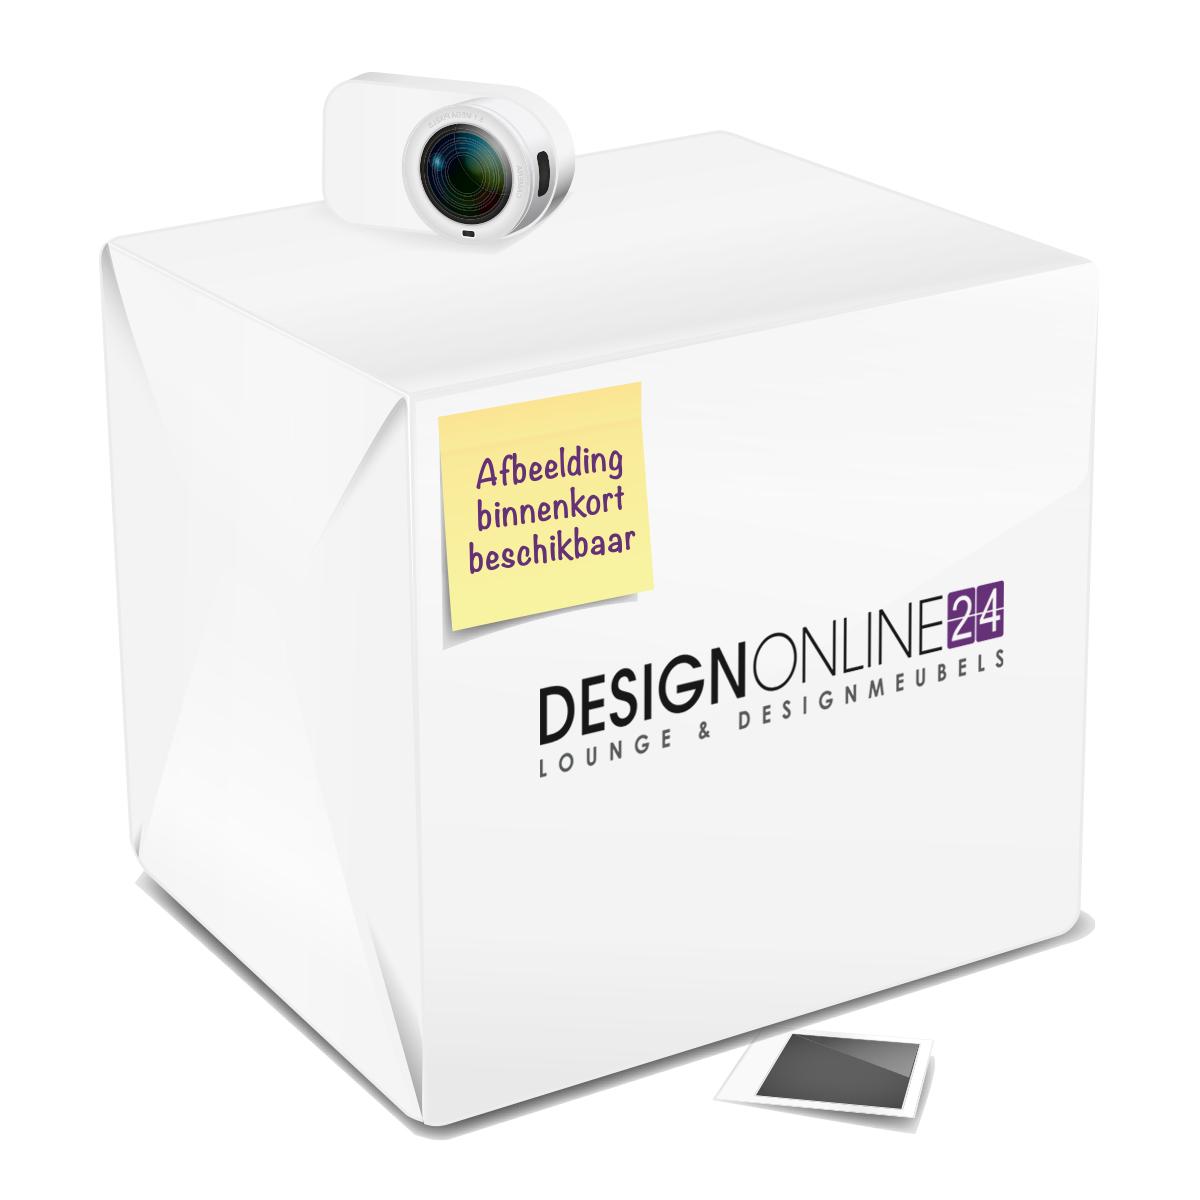 Tv Kast Donker Eikenhout.24designs Ottowa Dressoir Donker Eiken Designonline24